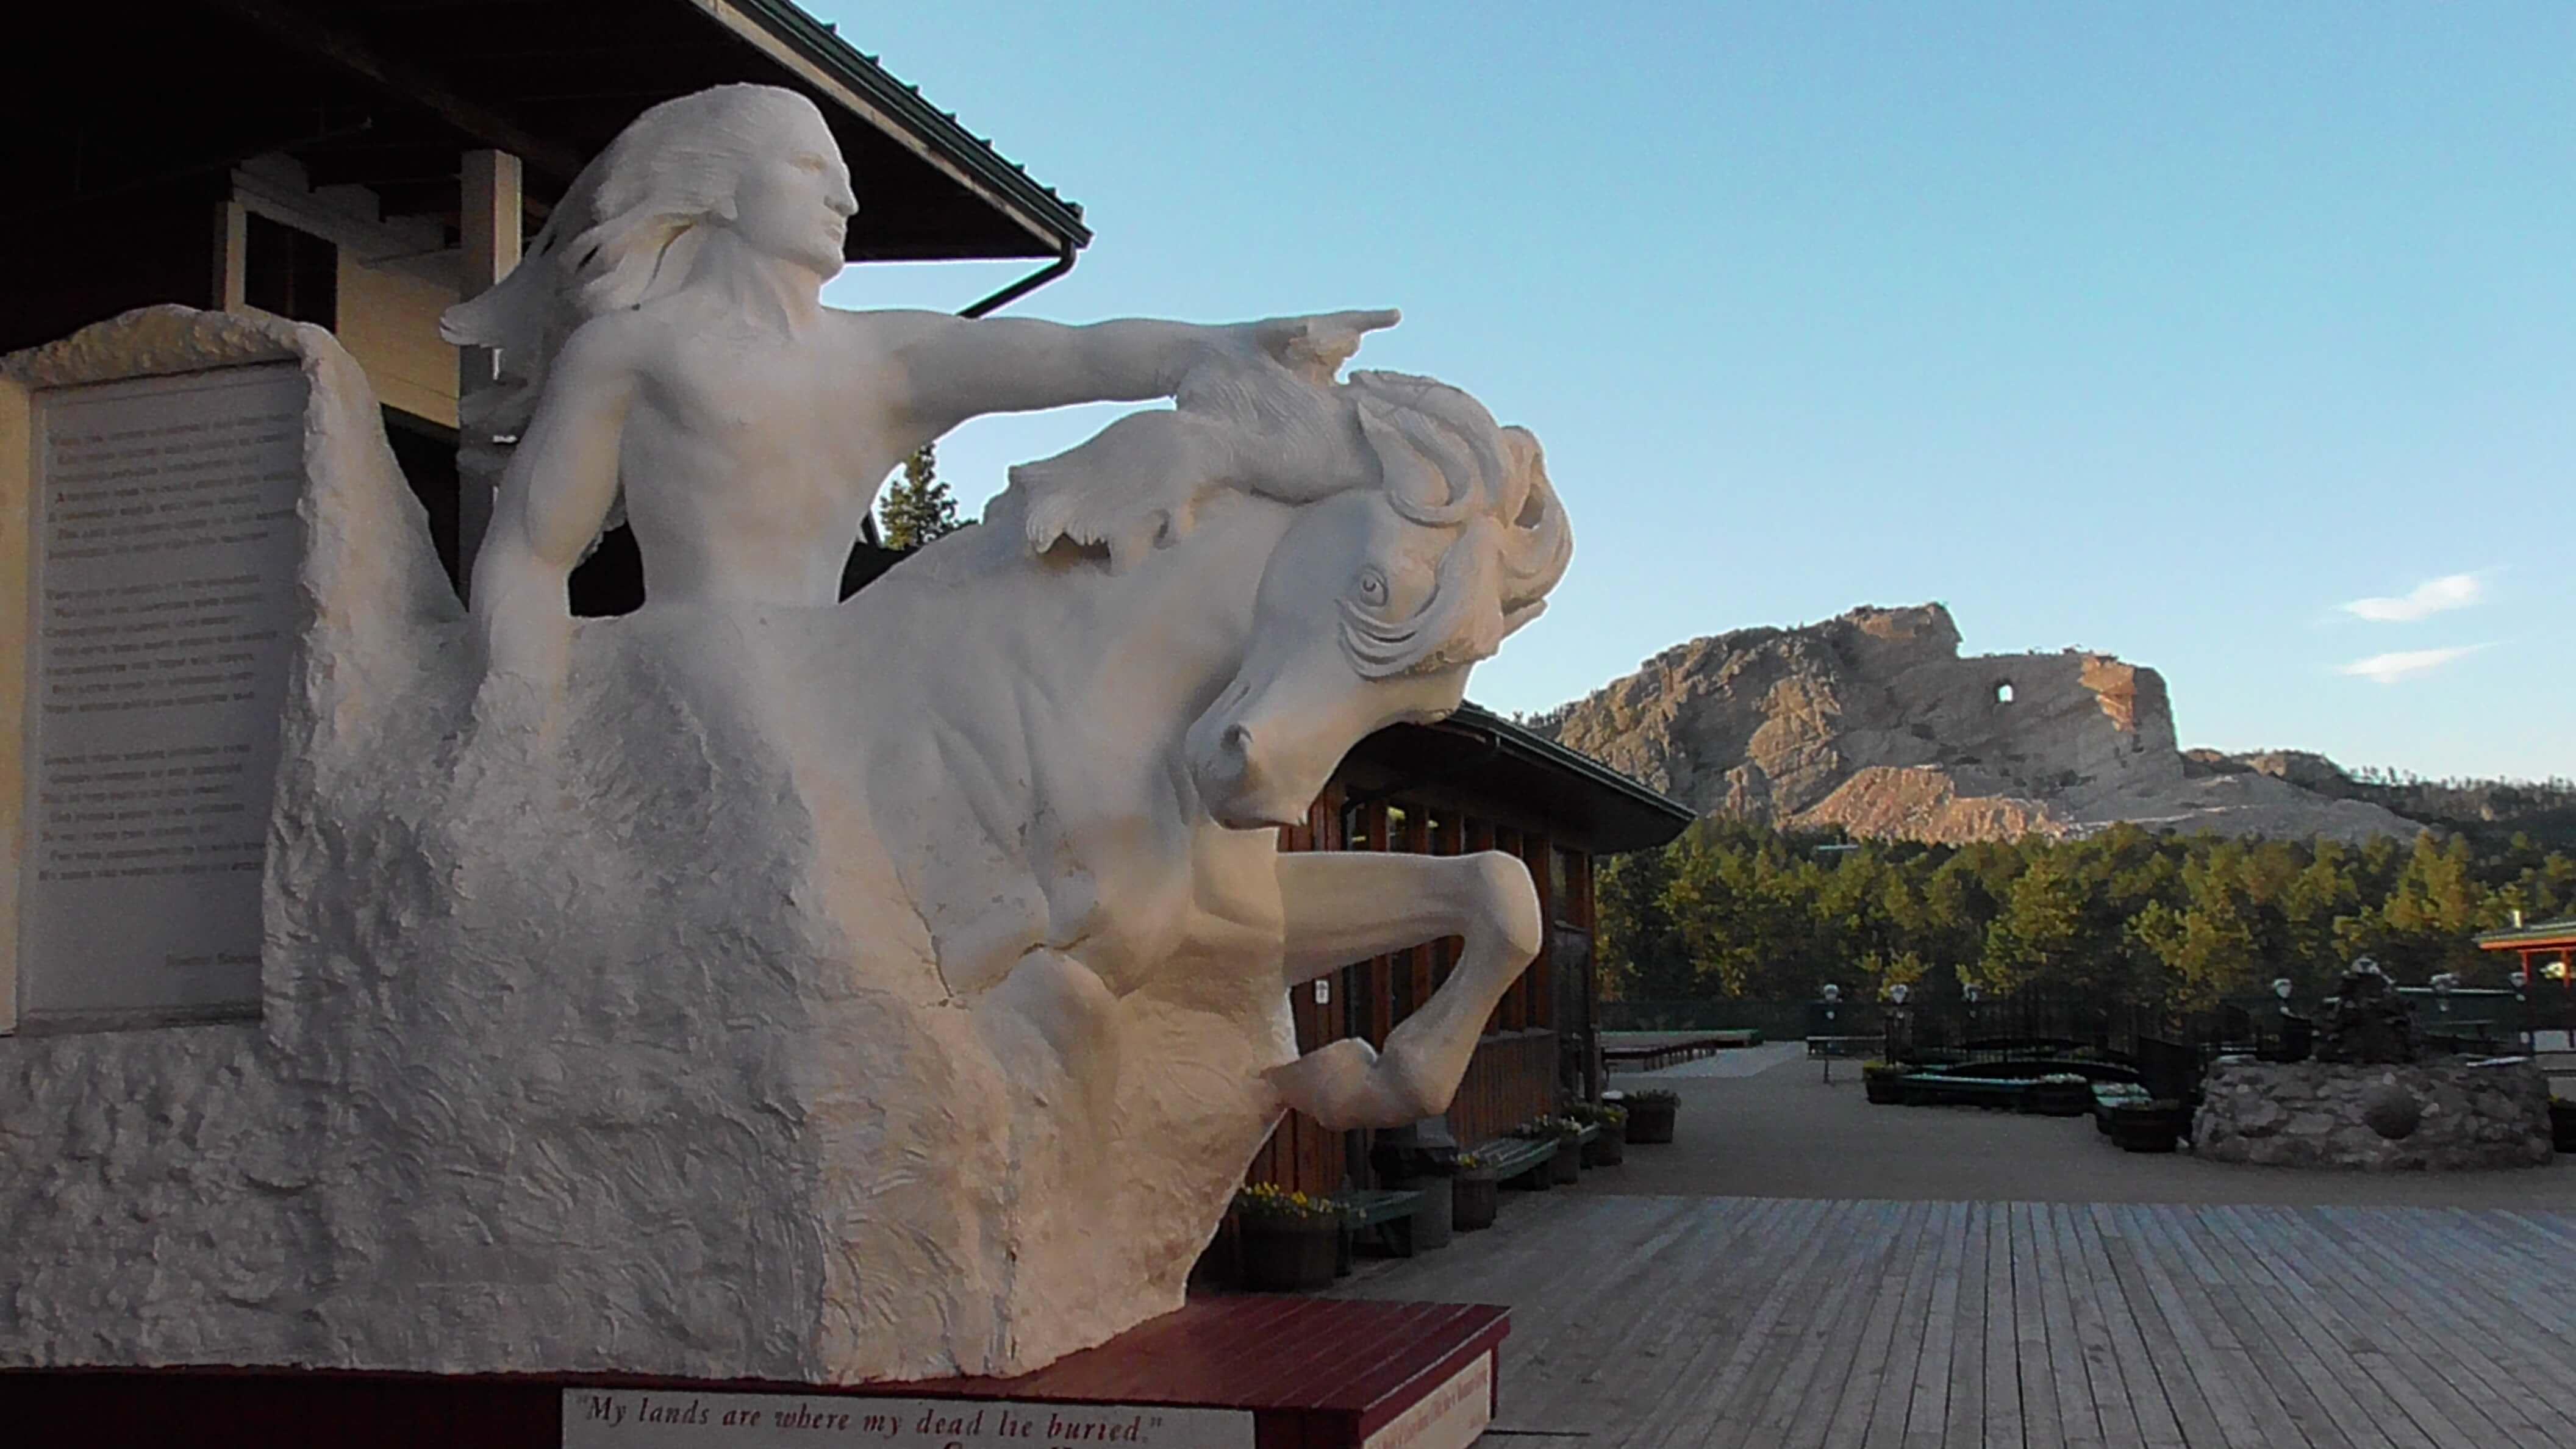 Crazy Horse Memorial and model